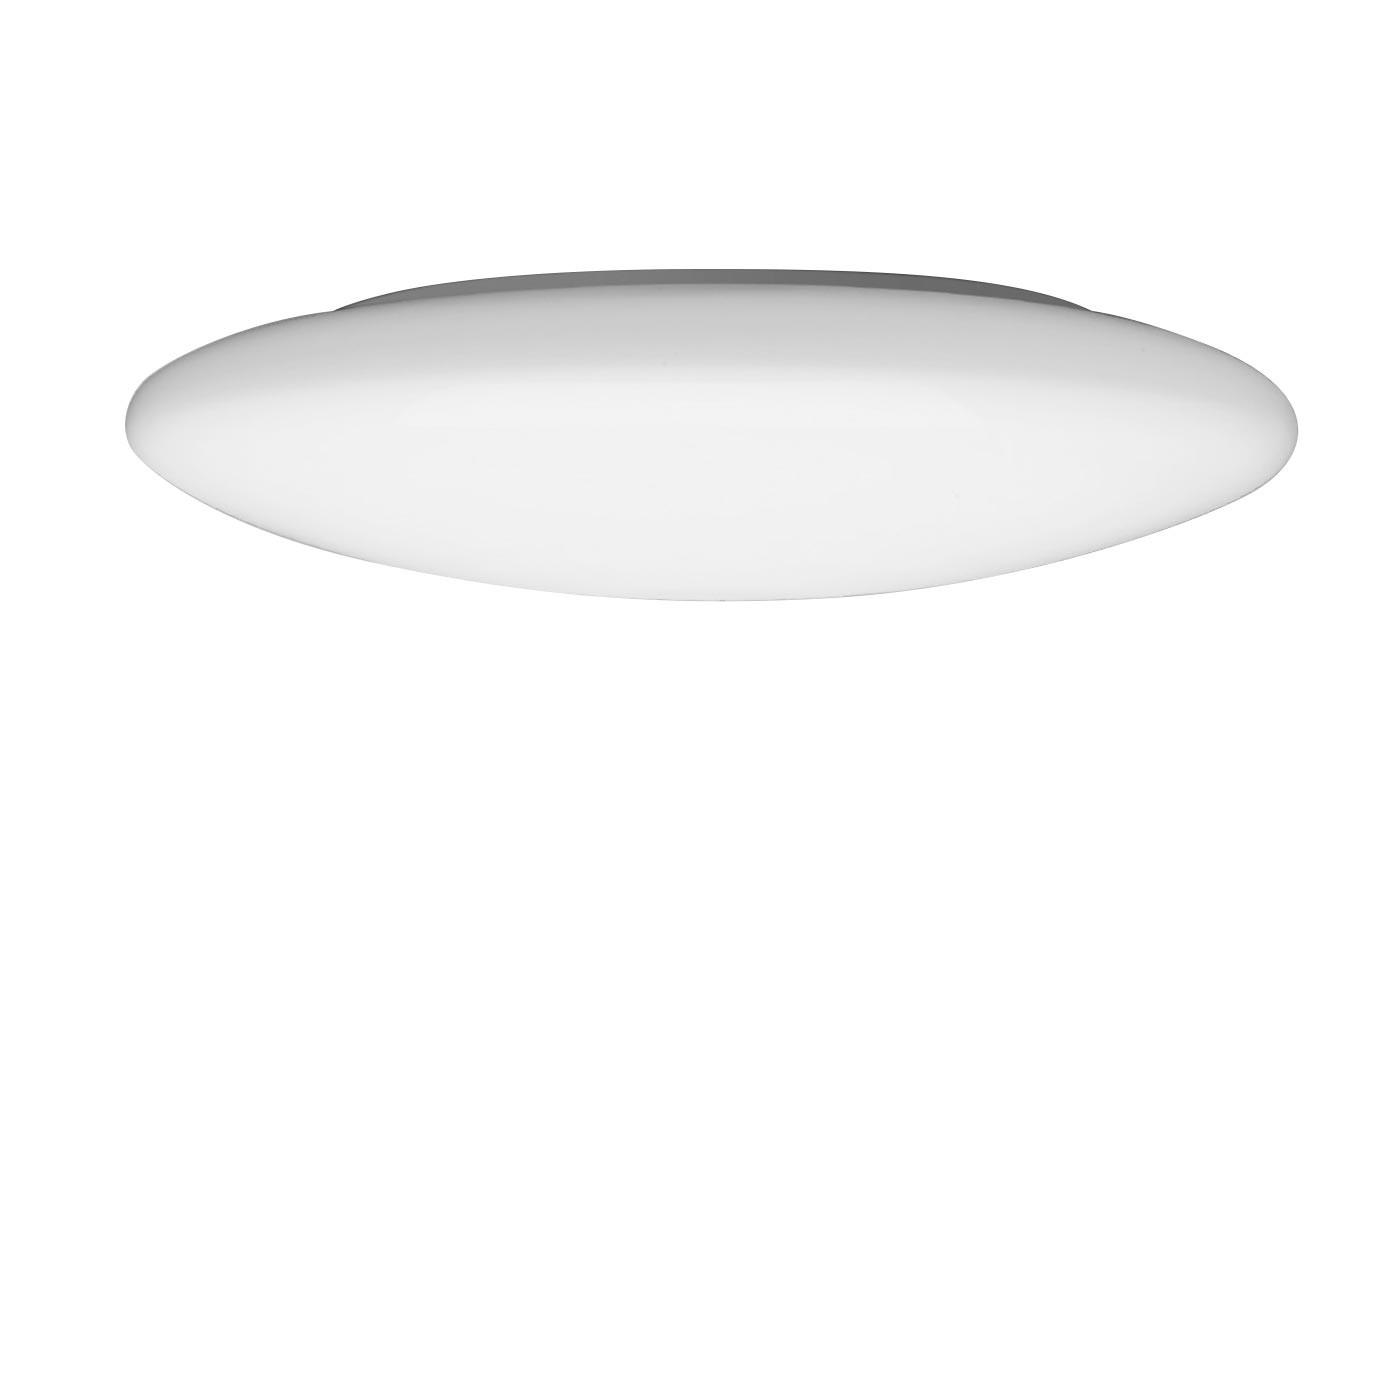 Bega 23296 / 23414 / 23299 LED applique murale ou plafonnier